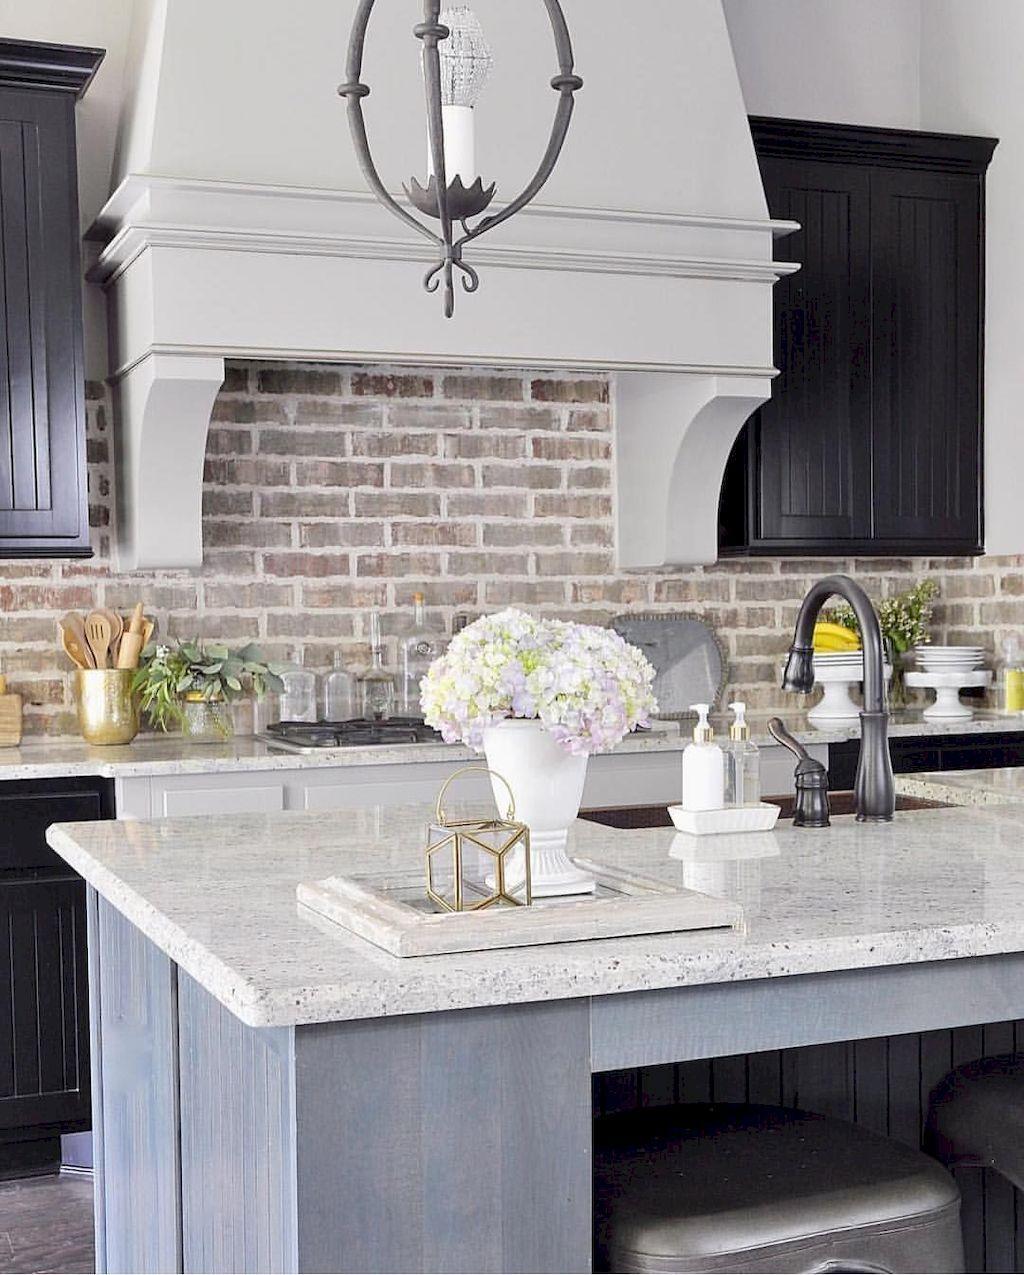 28 Best Modern Farmhouse Kitchen Cabinets Ideas Insidecorate Com Farmhouse Kitchen Backsplash Farmhouse Kitchen Colors Kitchen Remodel Small